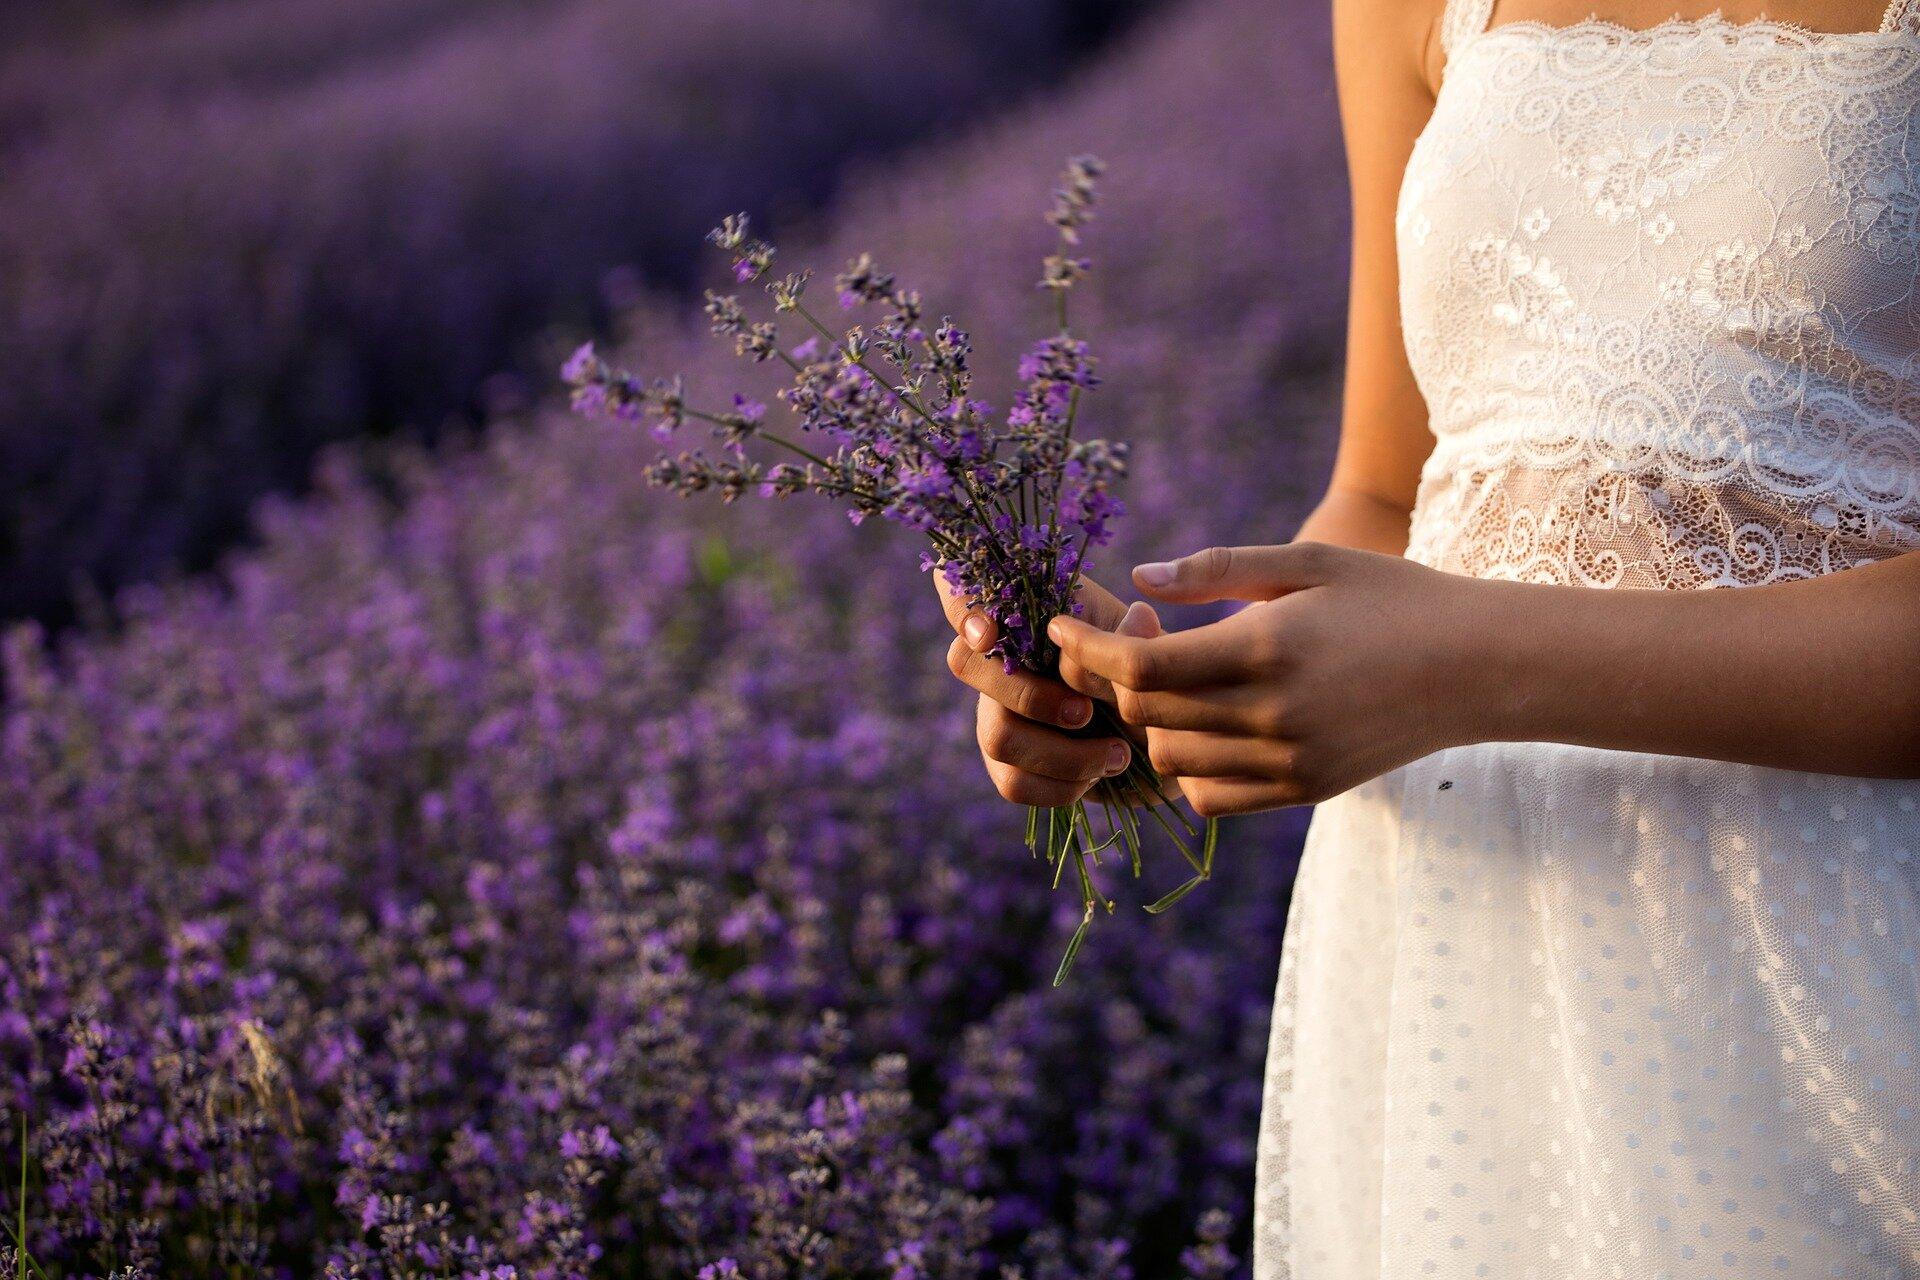 lavender-3576132_1920.jpg